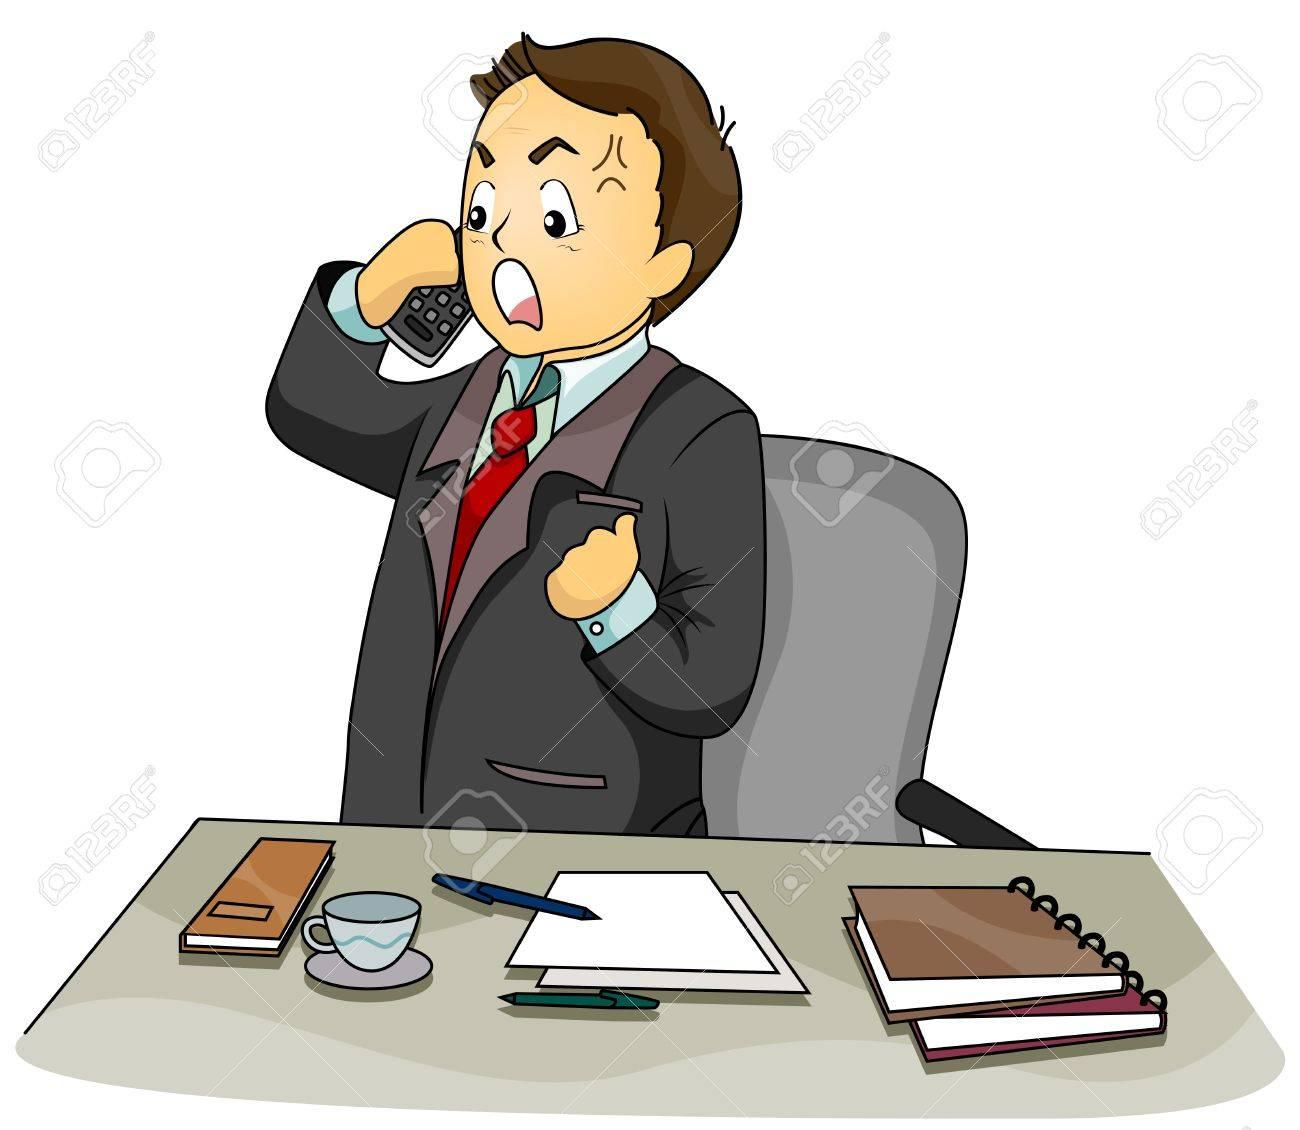 Illustration Featuring an Upset Businessman Talking on the Phone Stock Illustration - 8268608